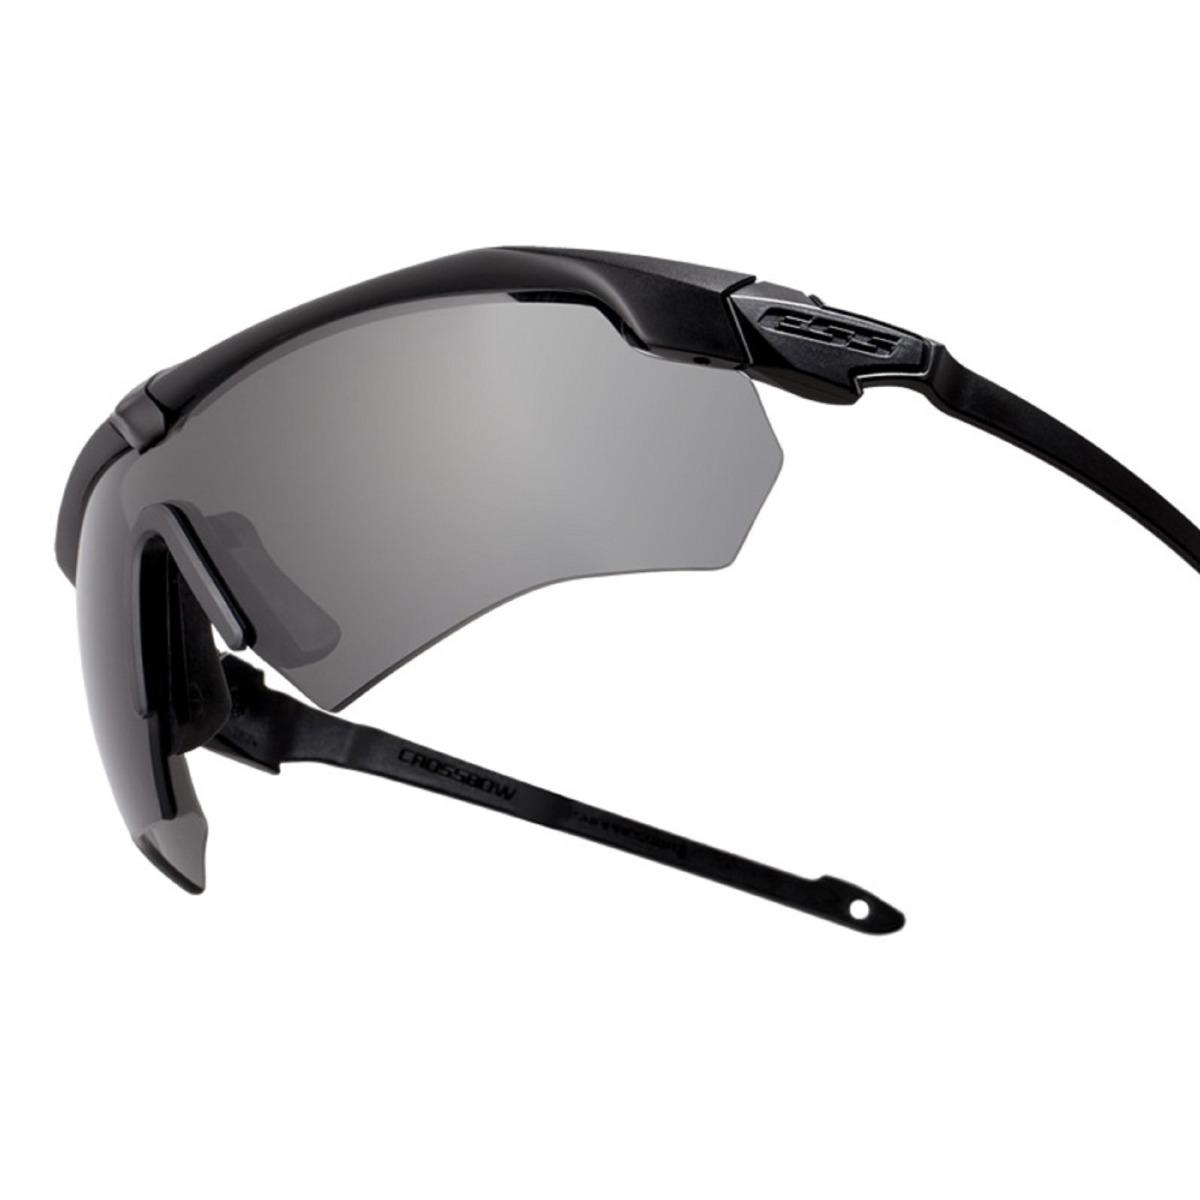 ec6c19c51ac Lentes Y Goggles Ess Eyewear Cdi Max Sunglasses Terrain Tan ...